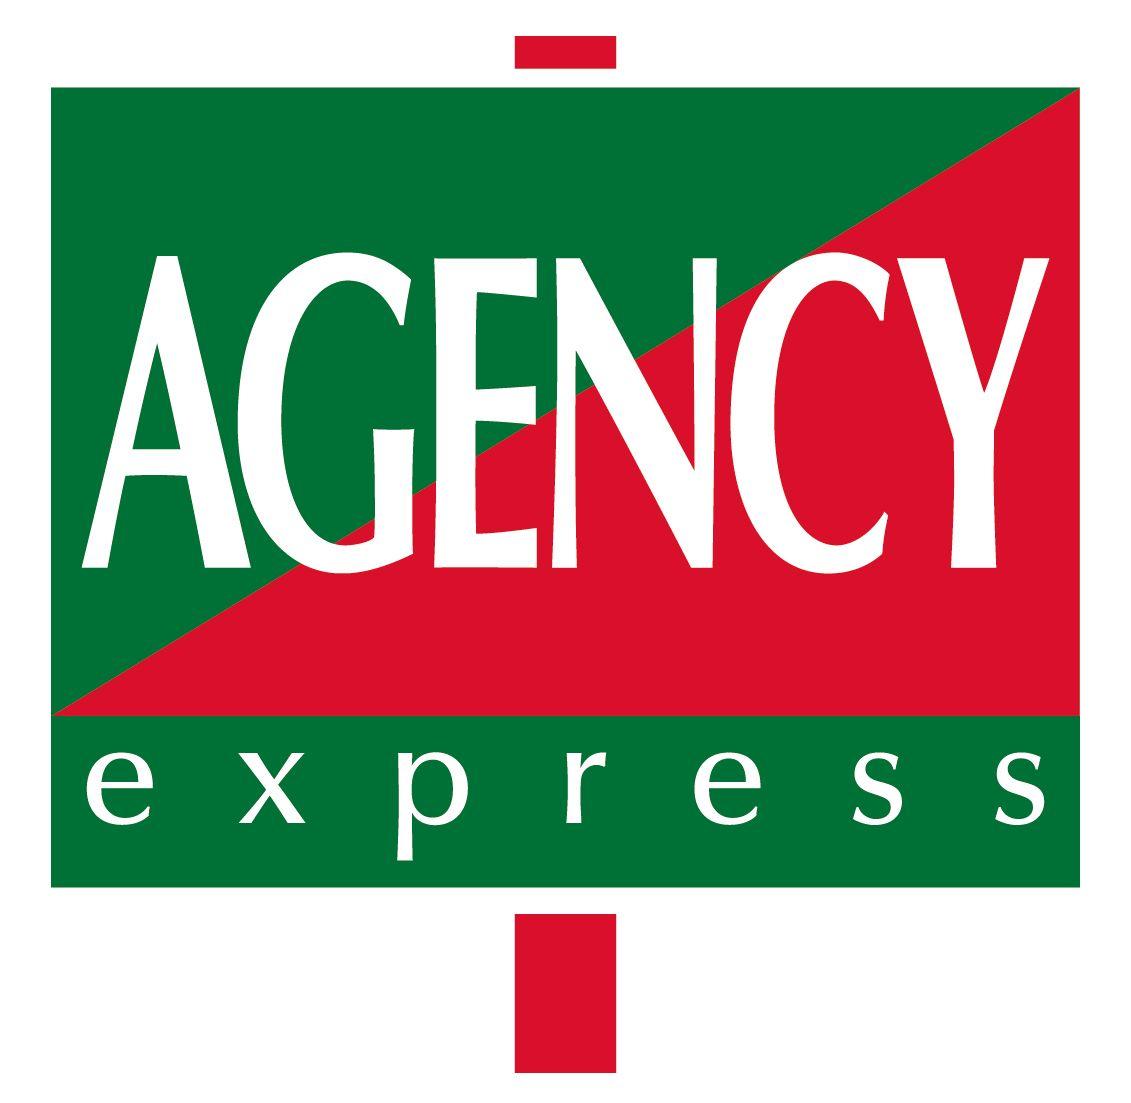 Agency-Express-Logo-Sign-Board-v2.jpg